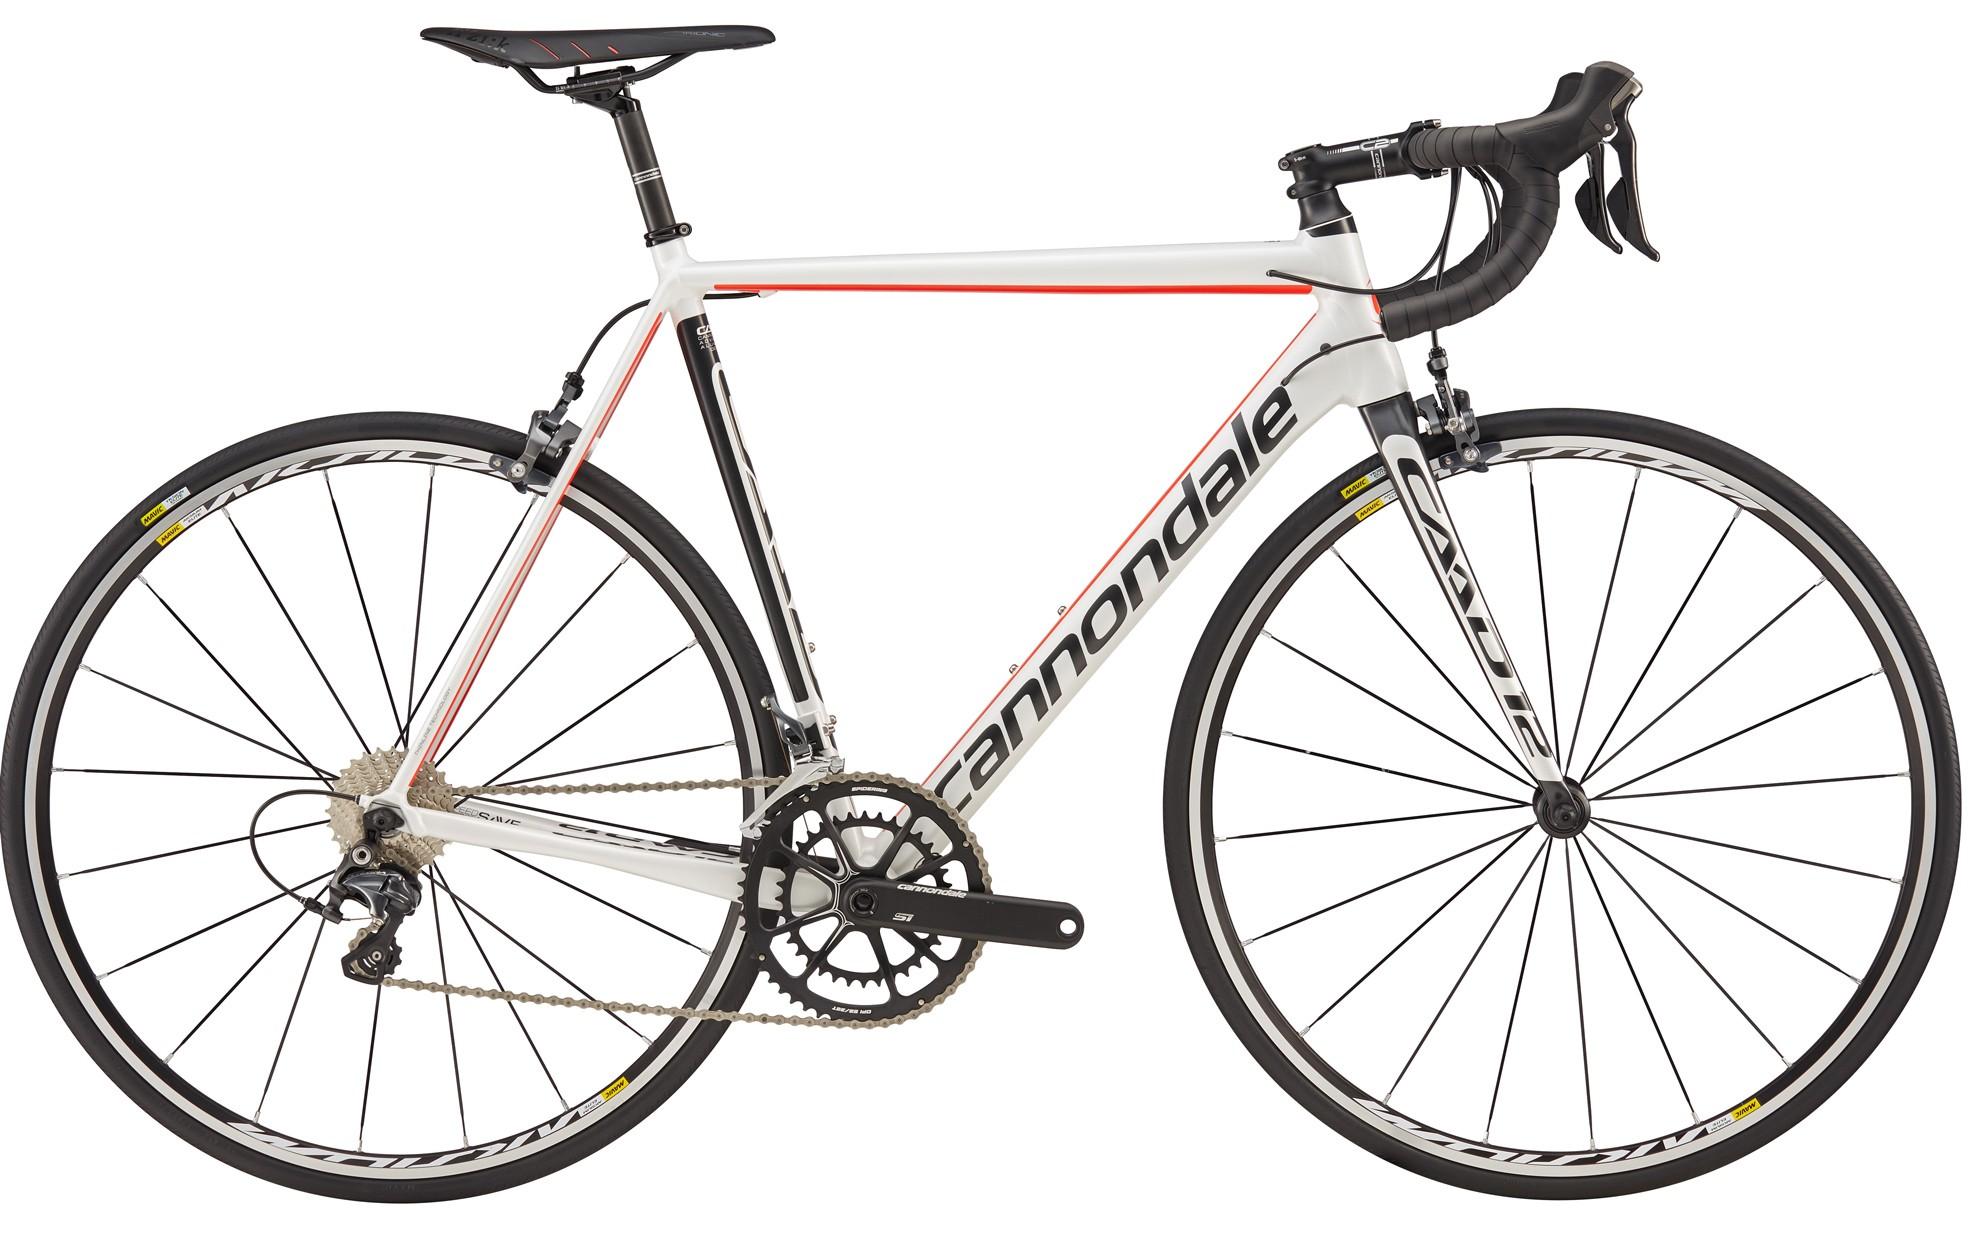 http://cycleshop-fun.com/images/caad12_ultegra_cas.jpg